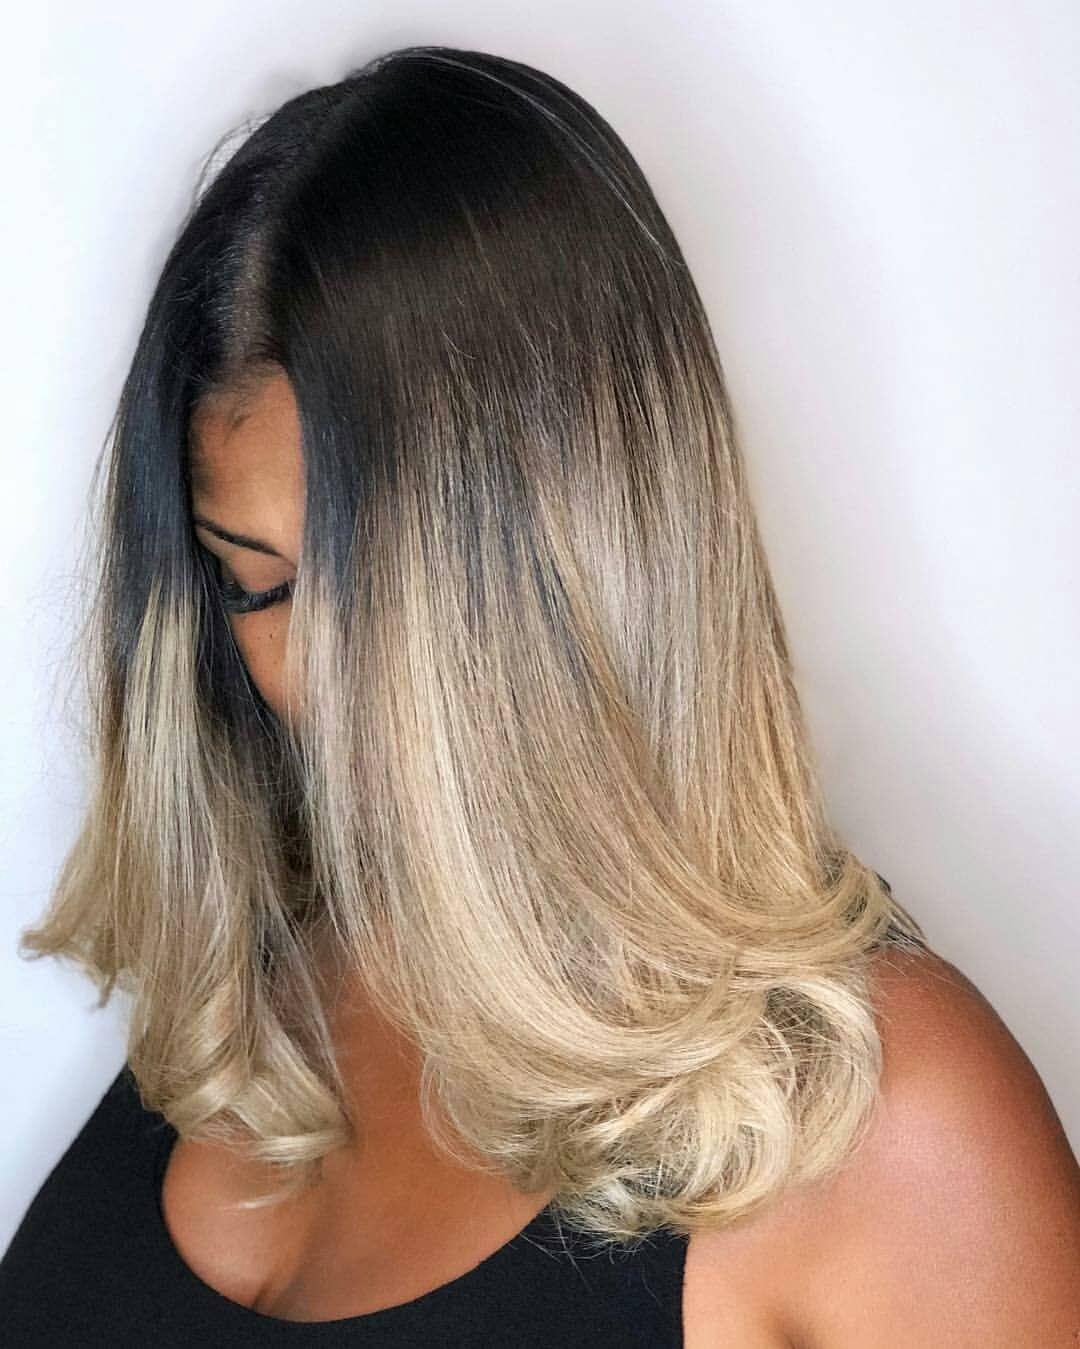 Pin De Jaque Em Hairs Inspiracao Cabelo Cores De Cabelo Cabelo